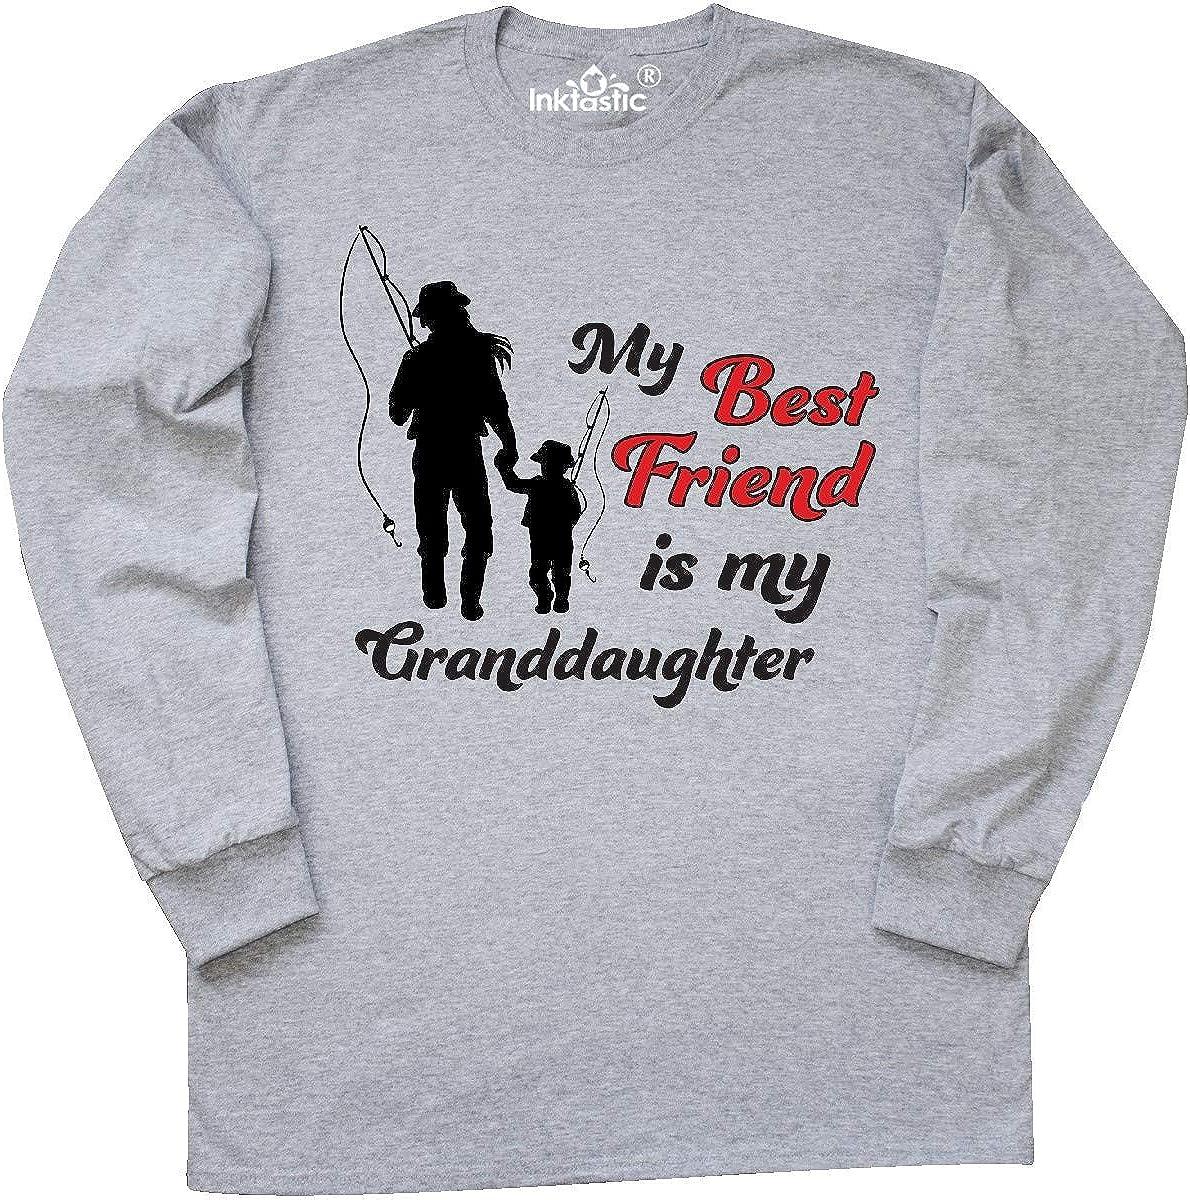 inktastic My Best Friend is My Grandson Baby T-Shirt